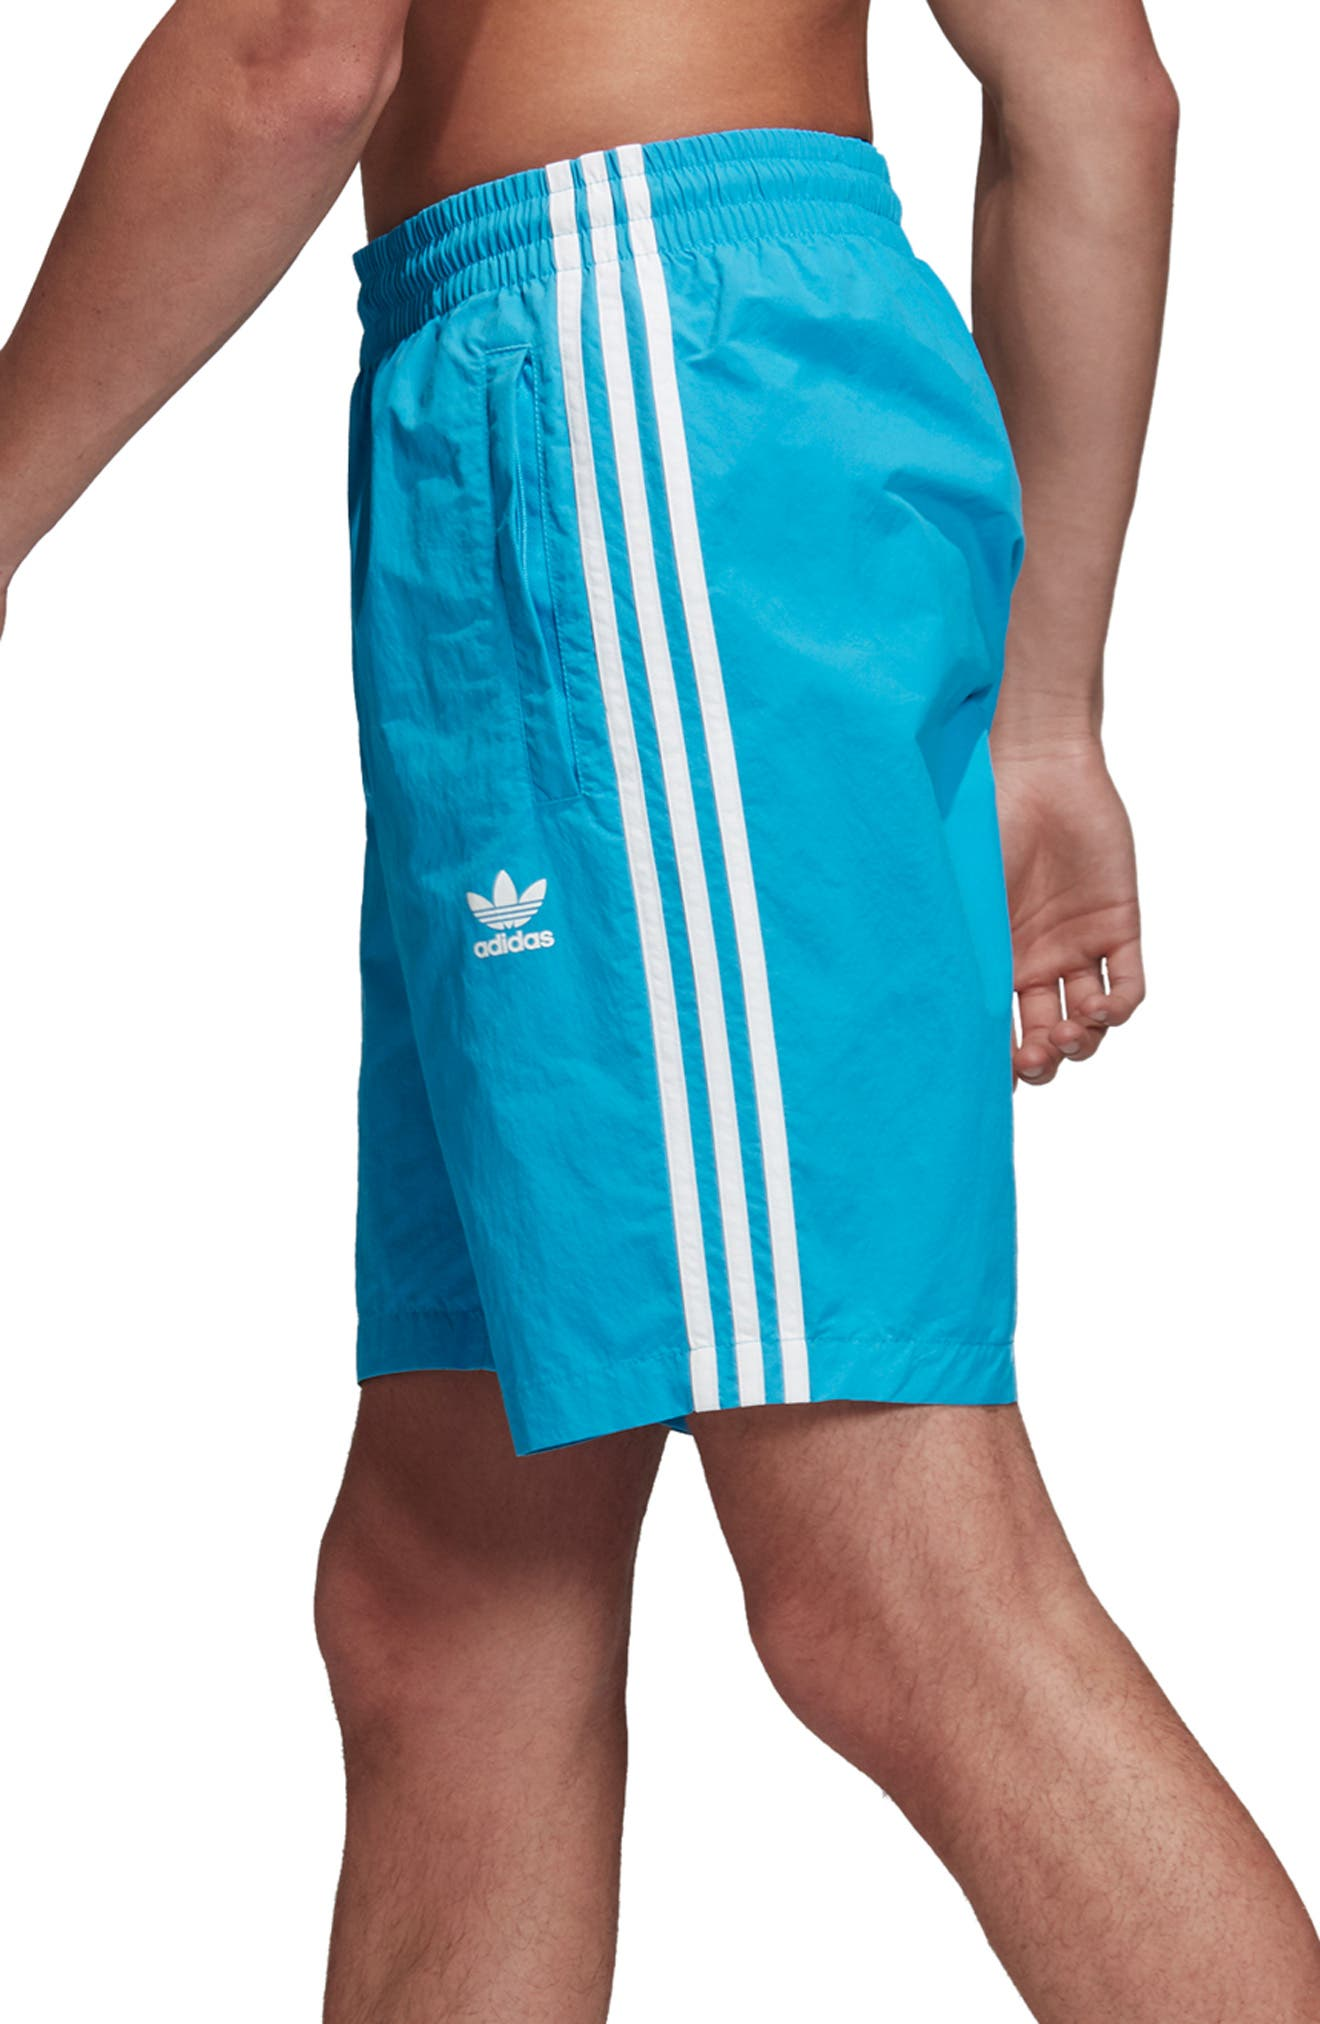 Men's Adidas Originals Swimwear, Boardshorts & Swim Trunks